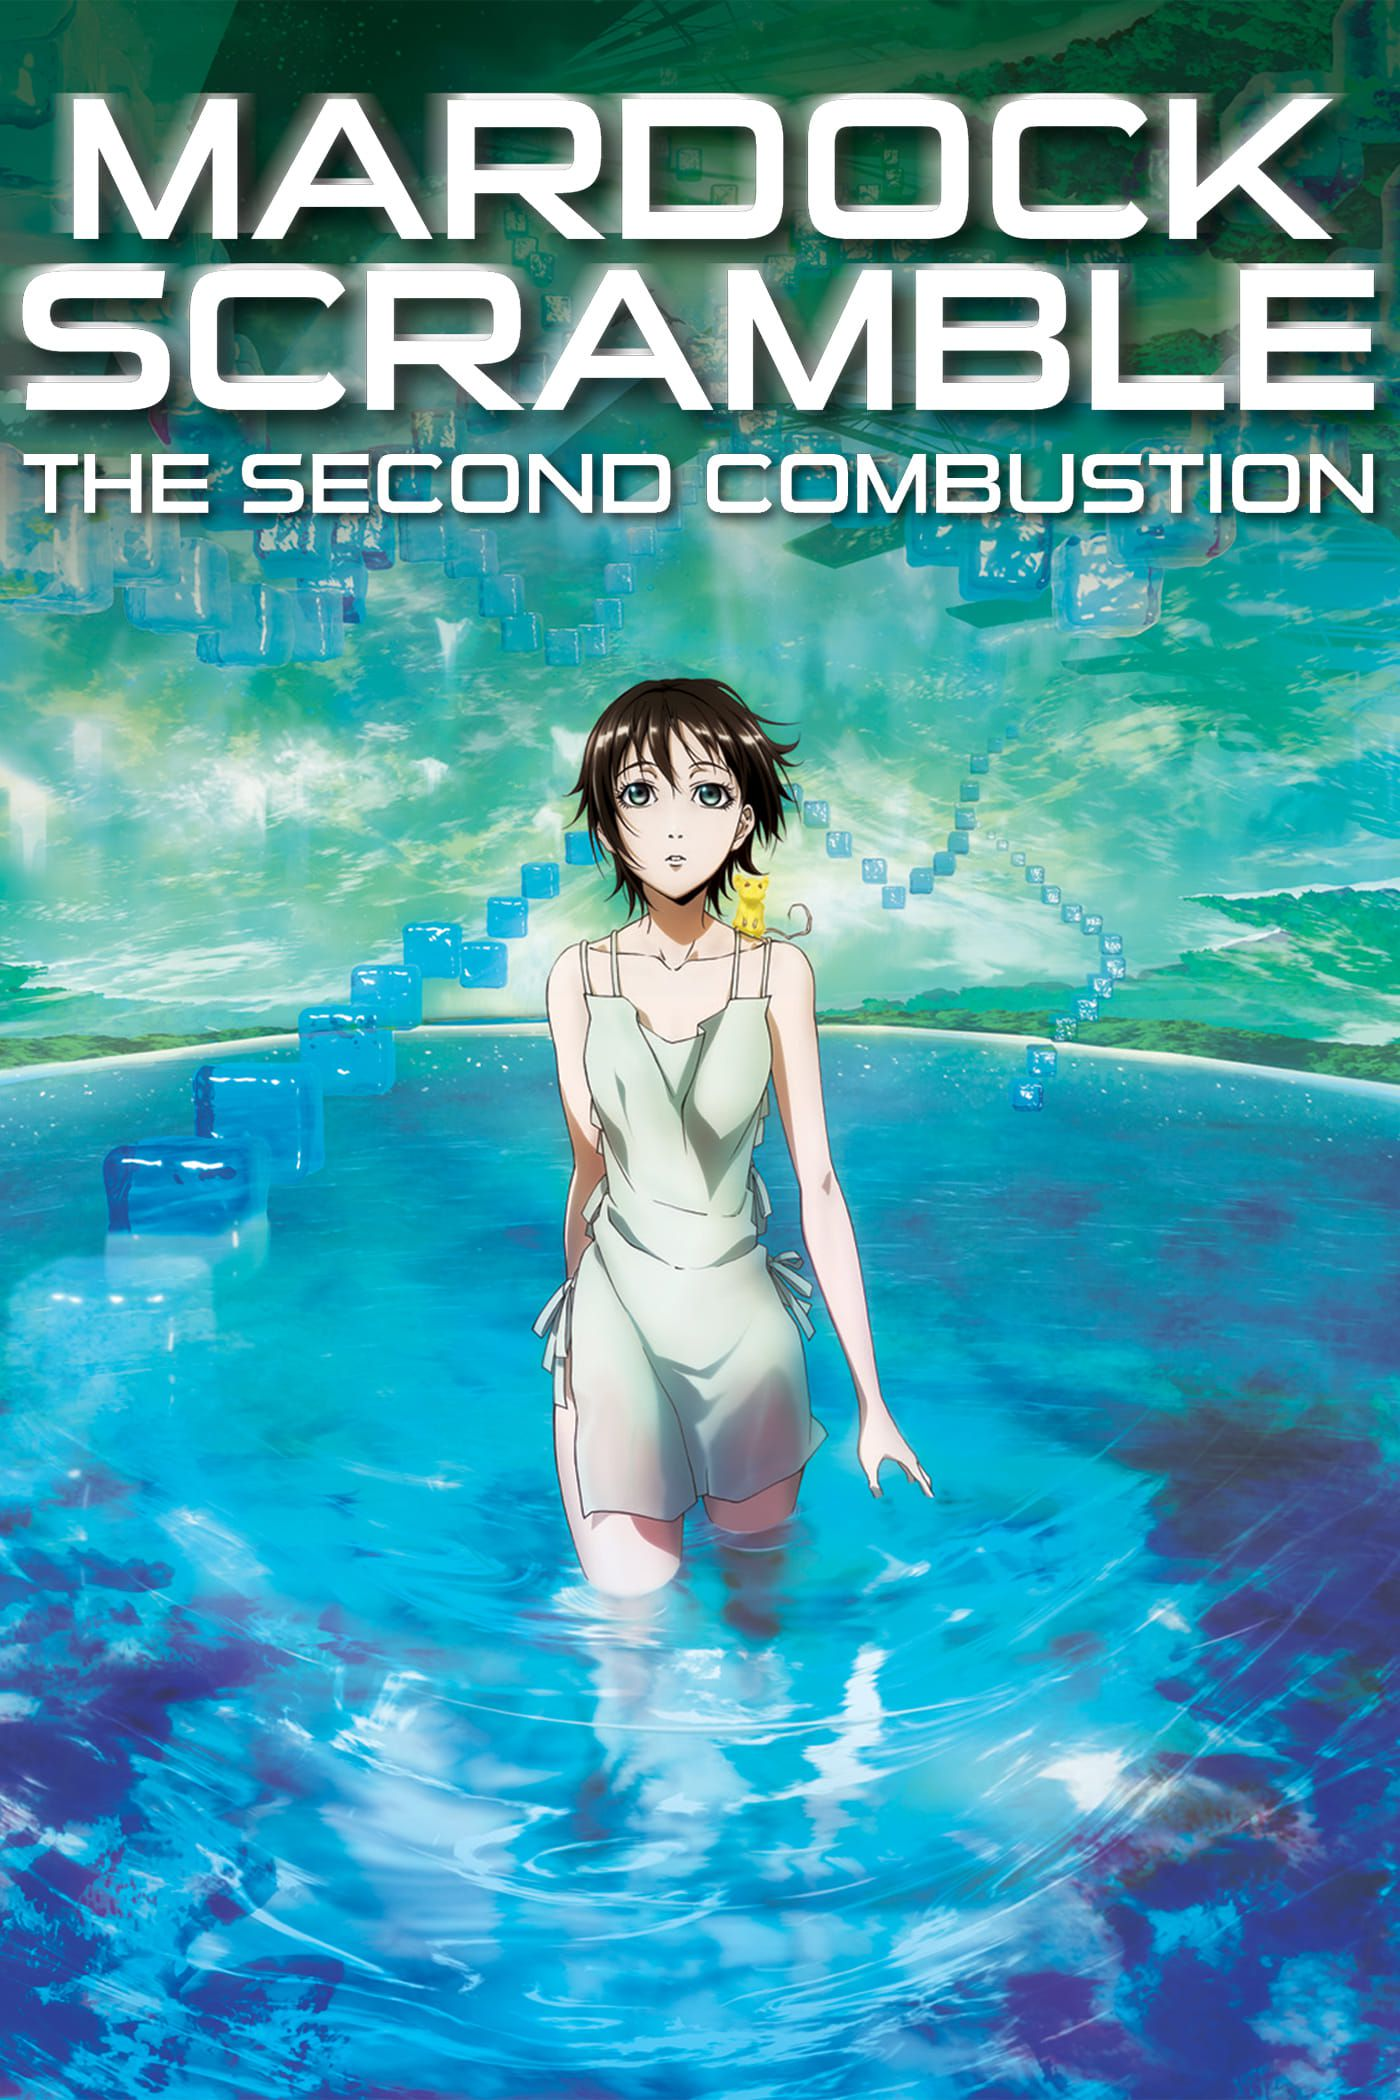 Mardock Scramble : The Second Combustion - Long-métrage d'animation (2011)